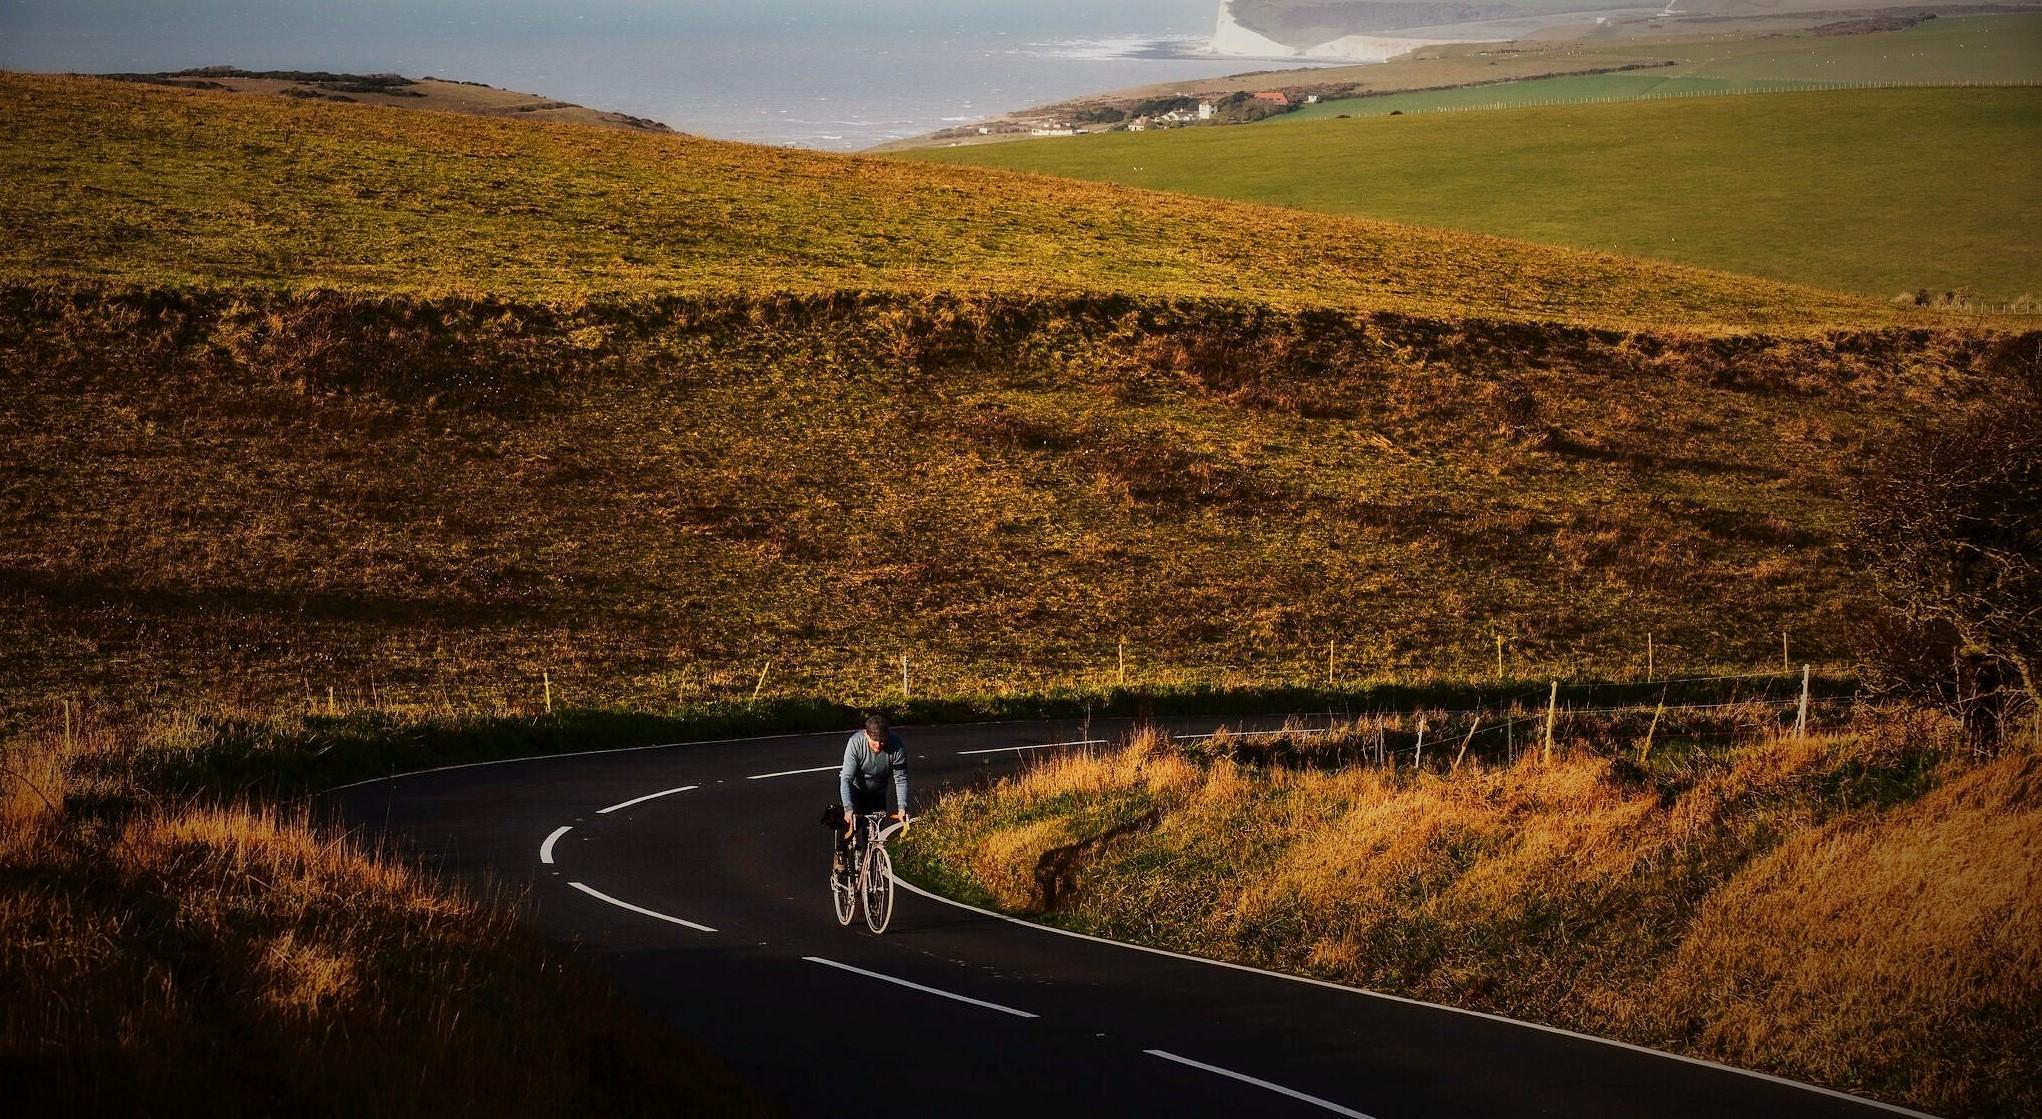 H μοναξιά του ποδηλάτη